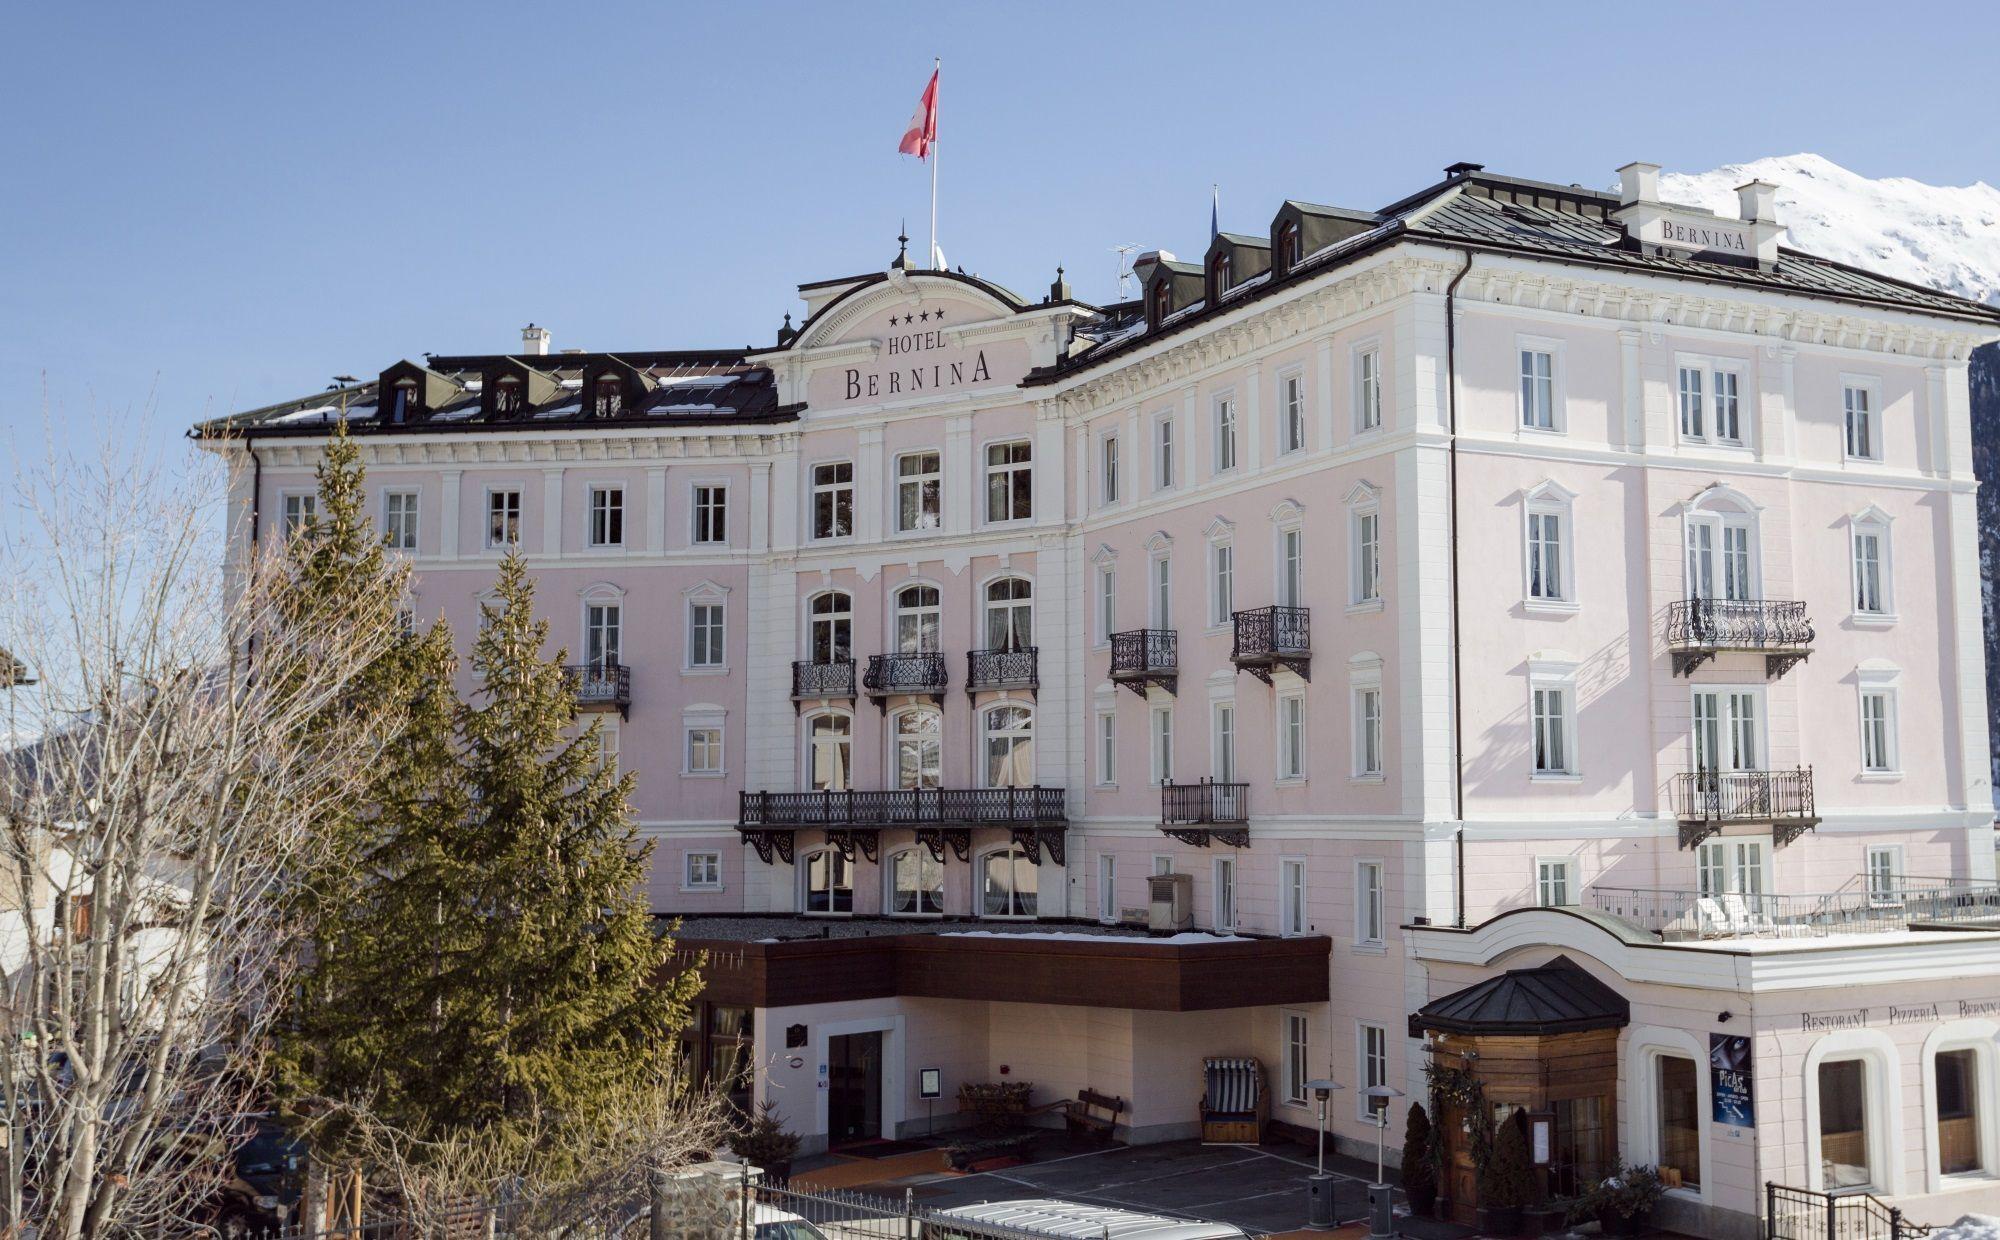 Hotel Bernina 1865